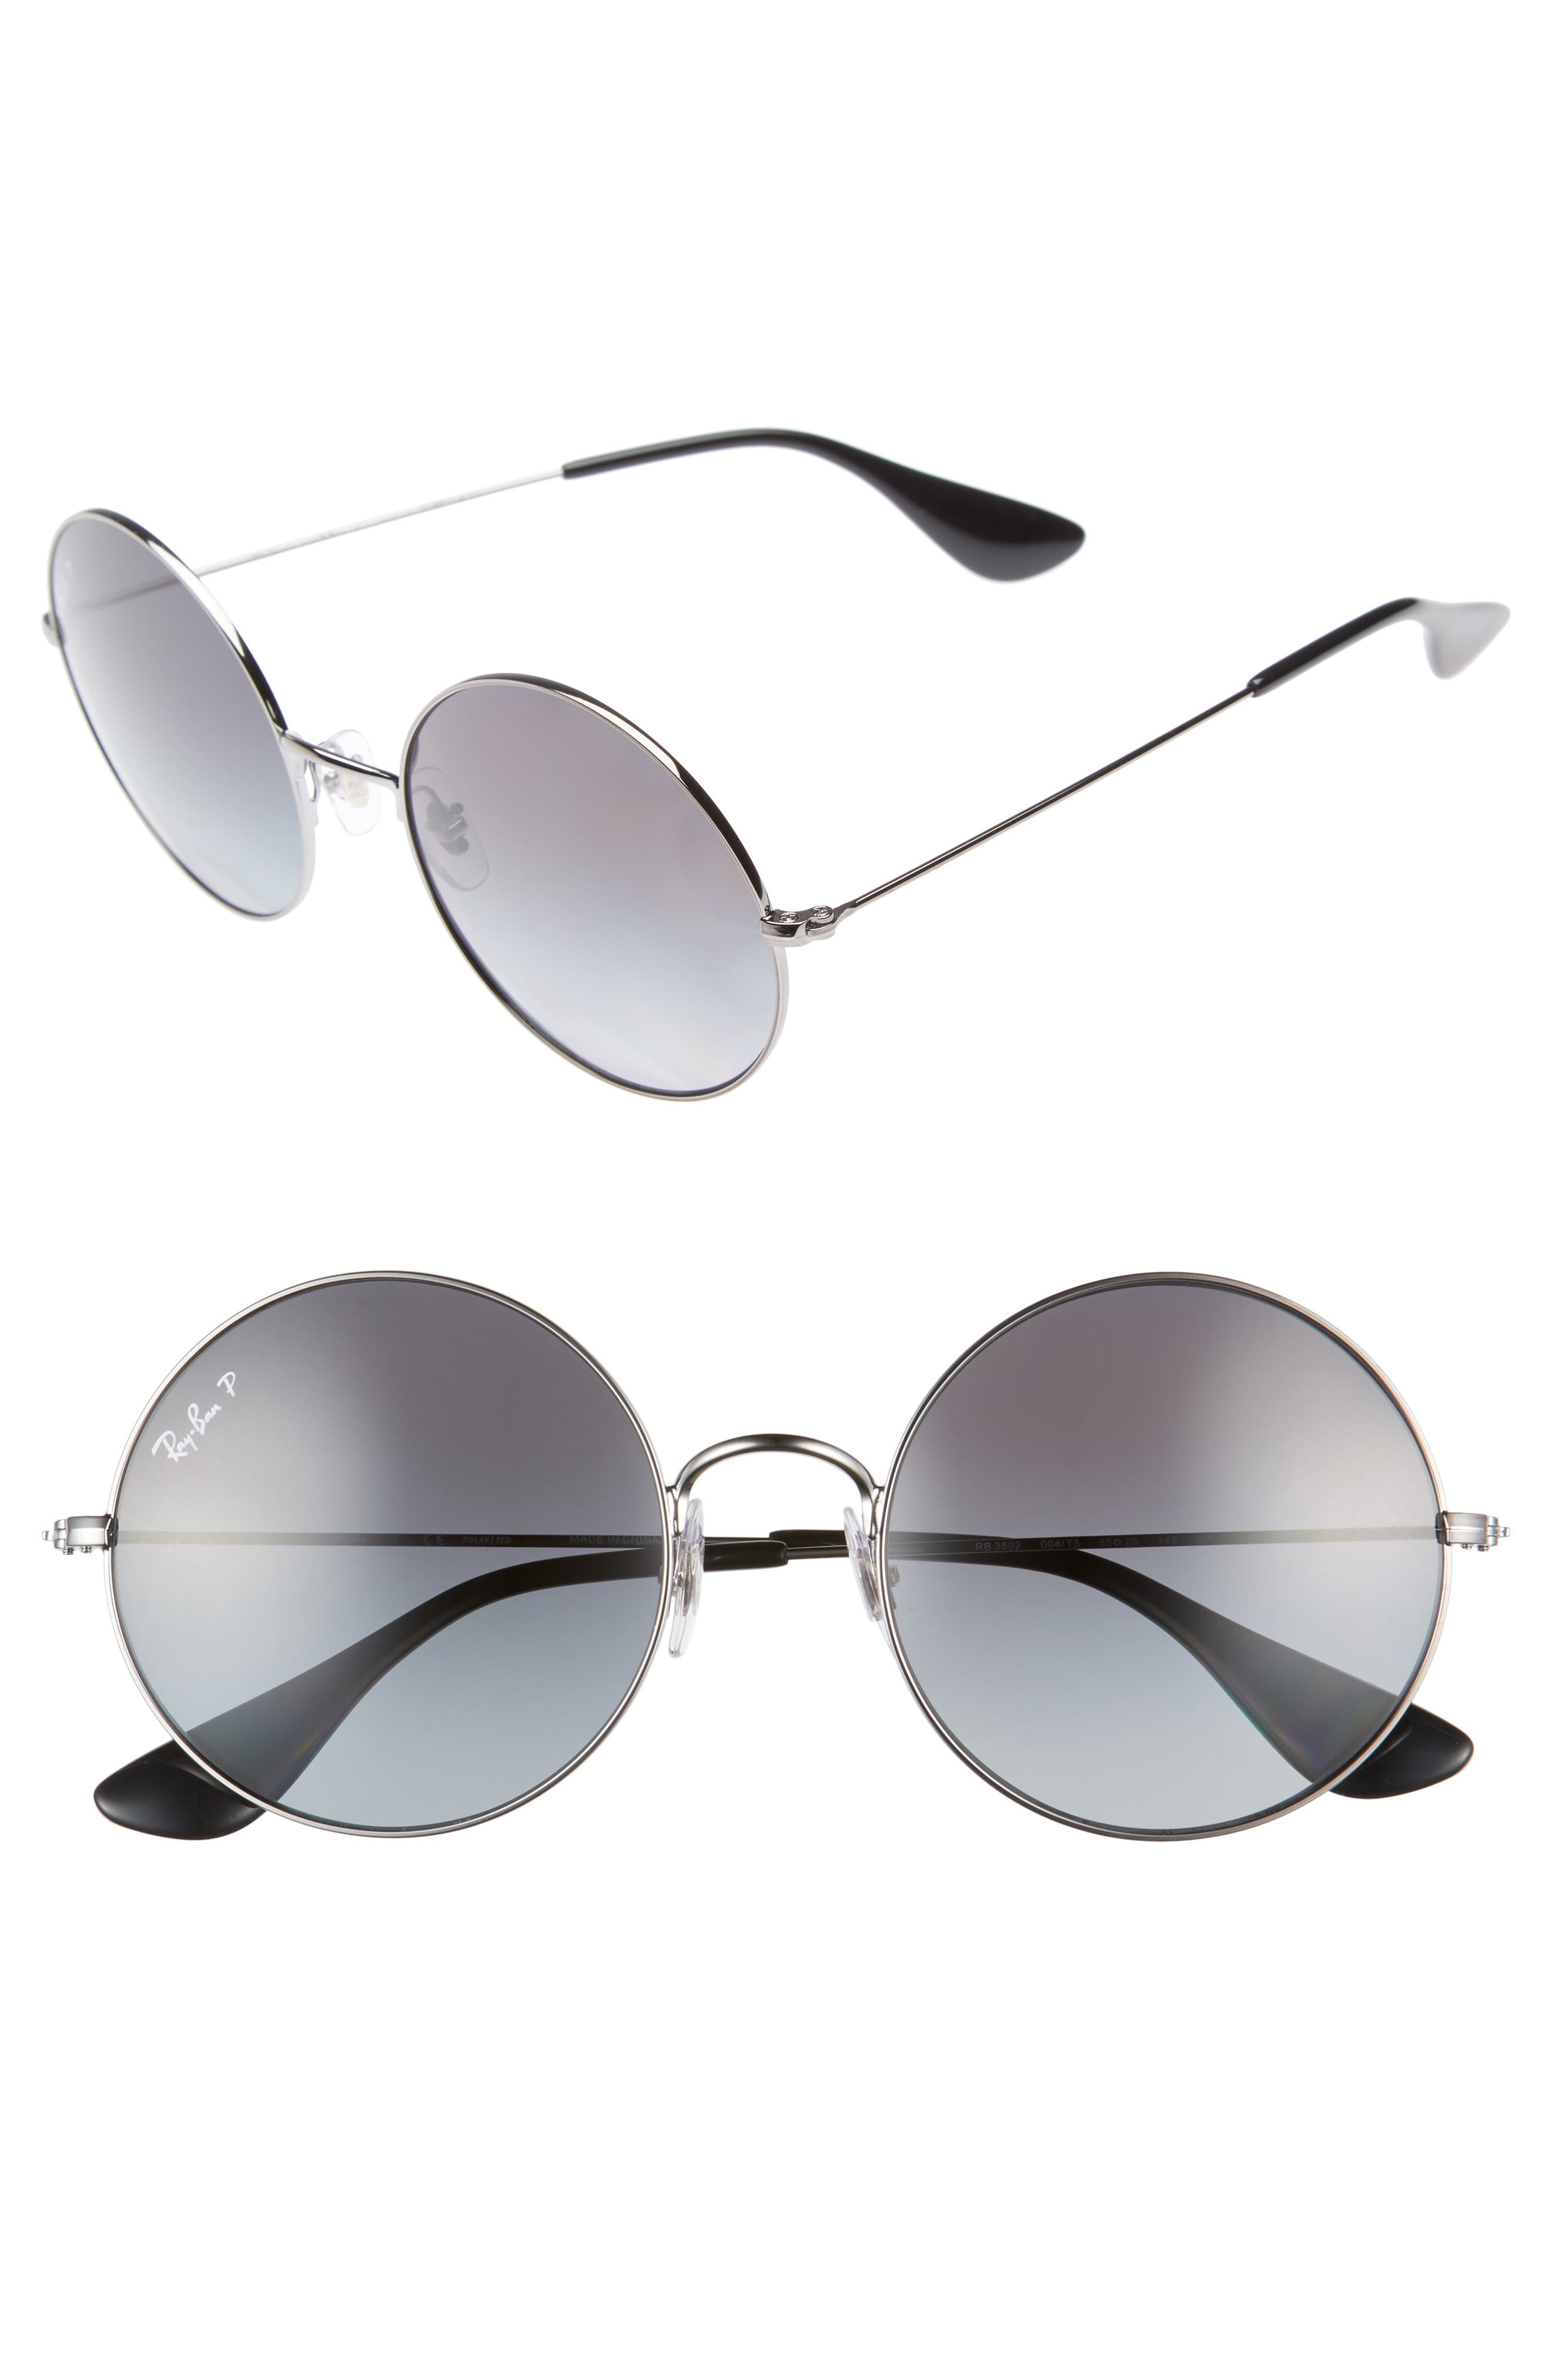 55mm Polarized Round Sunglasses,                             Main thumbnail 1, color,